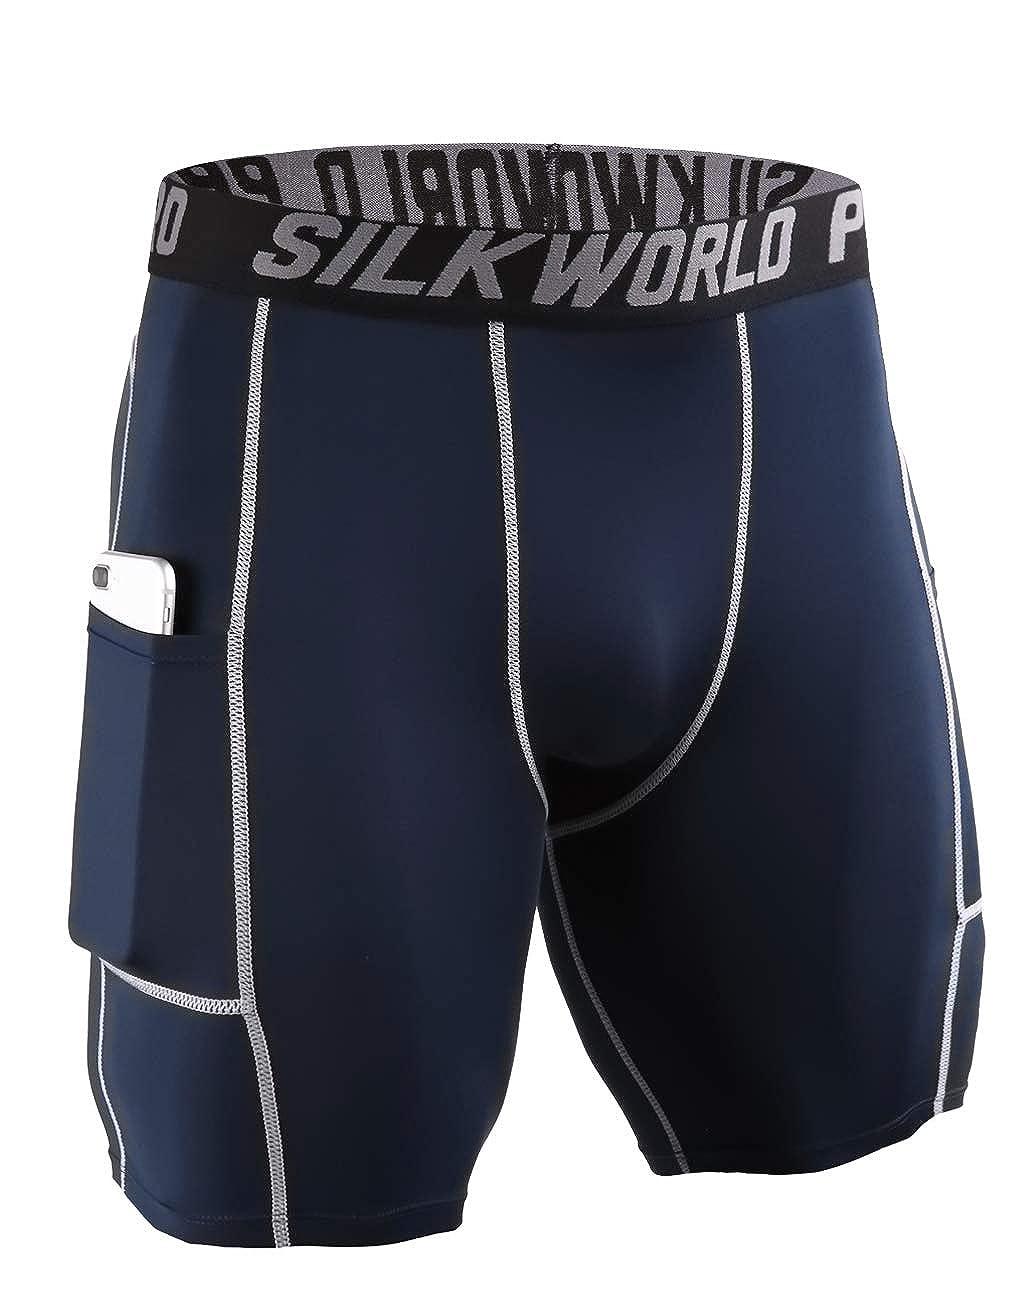 SILKWORLD Mens Compression Shorts Pockets Sports Running Tight